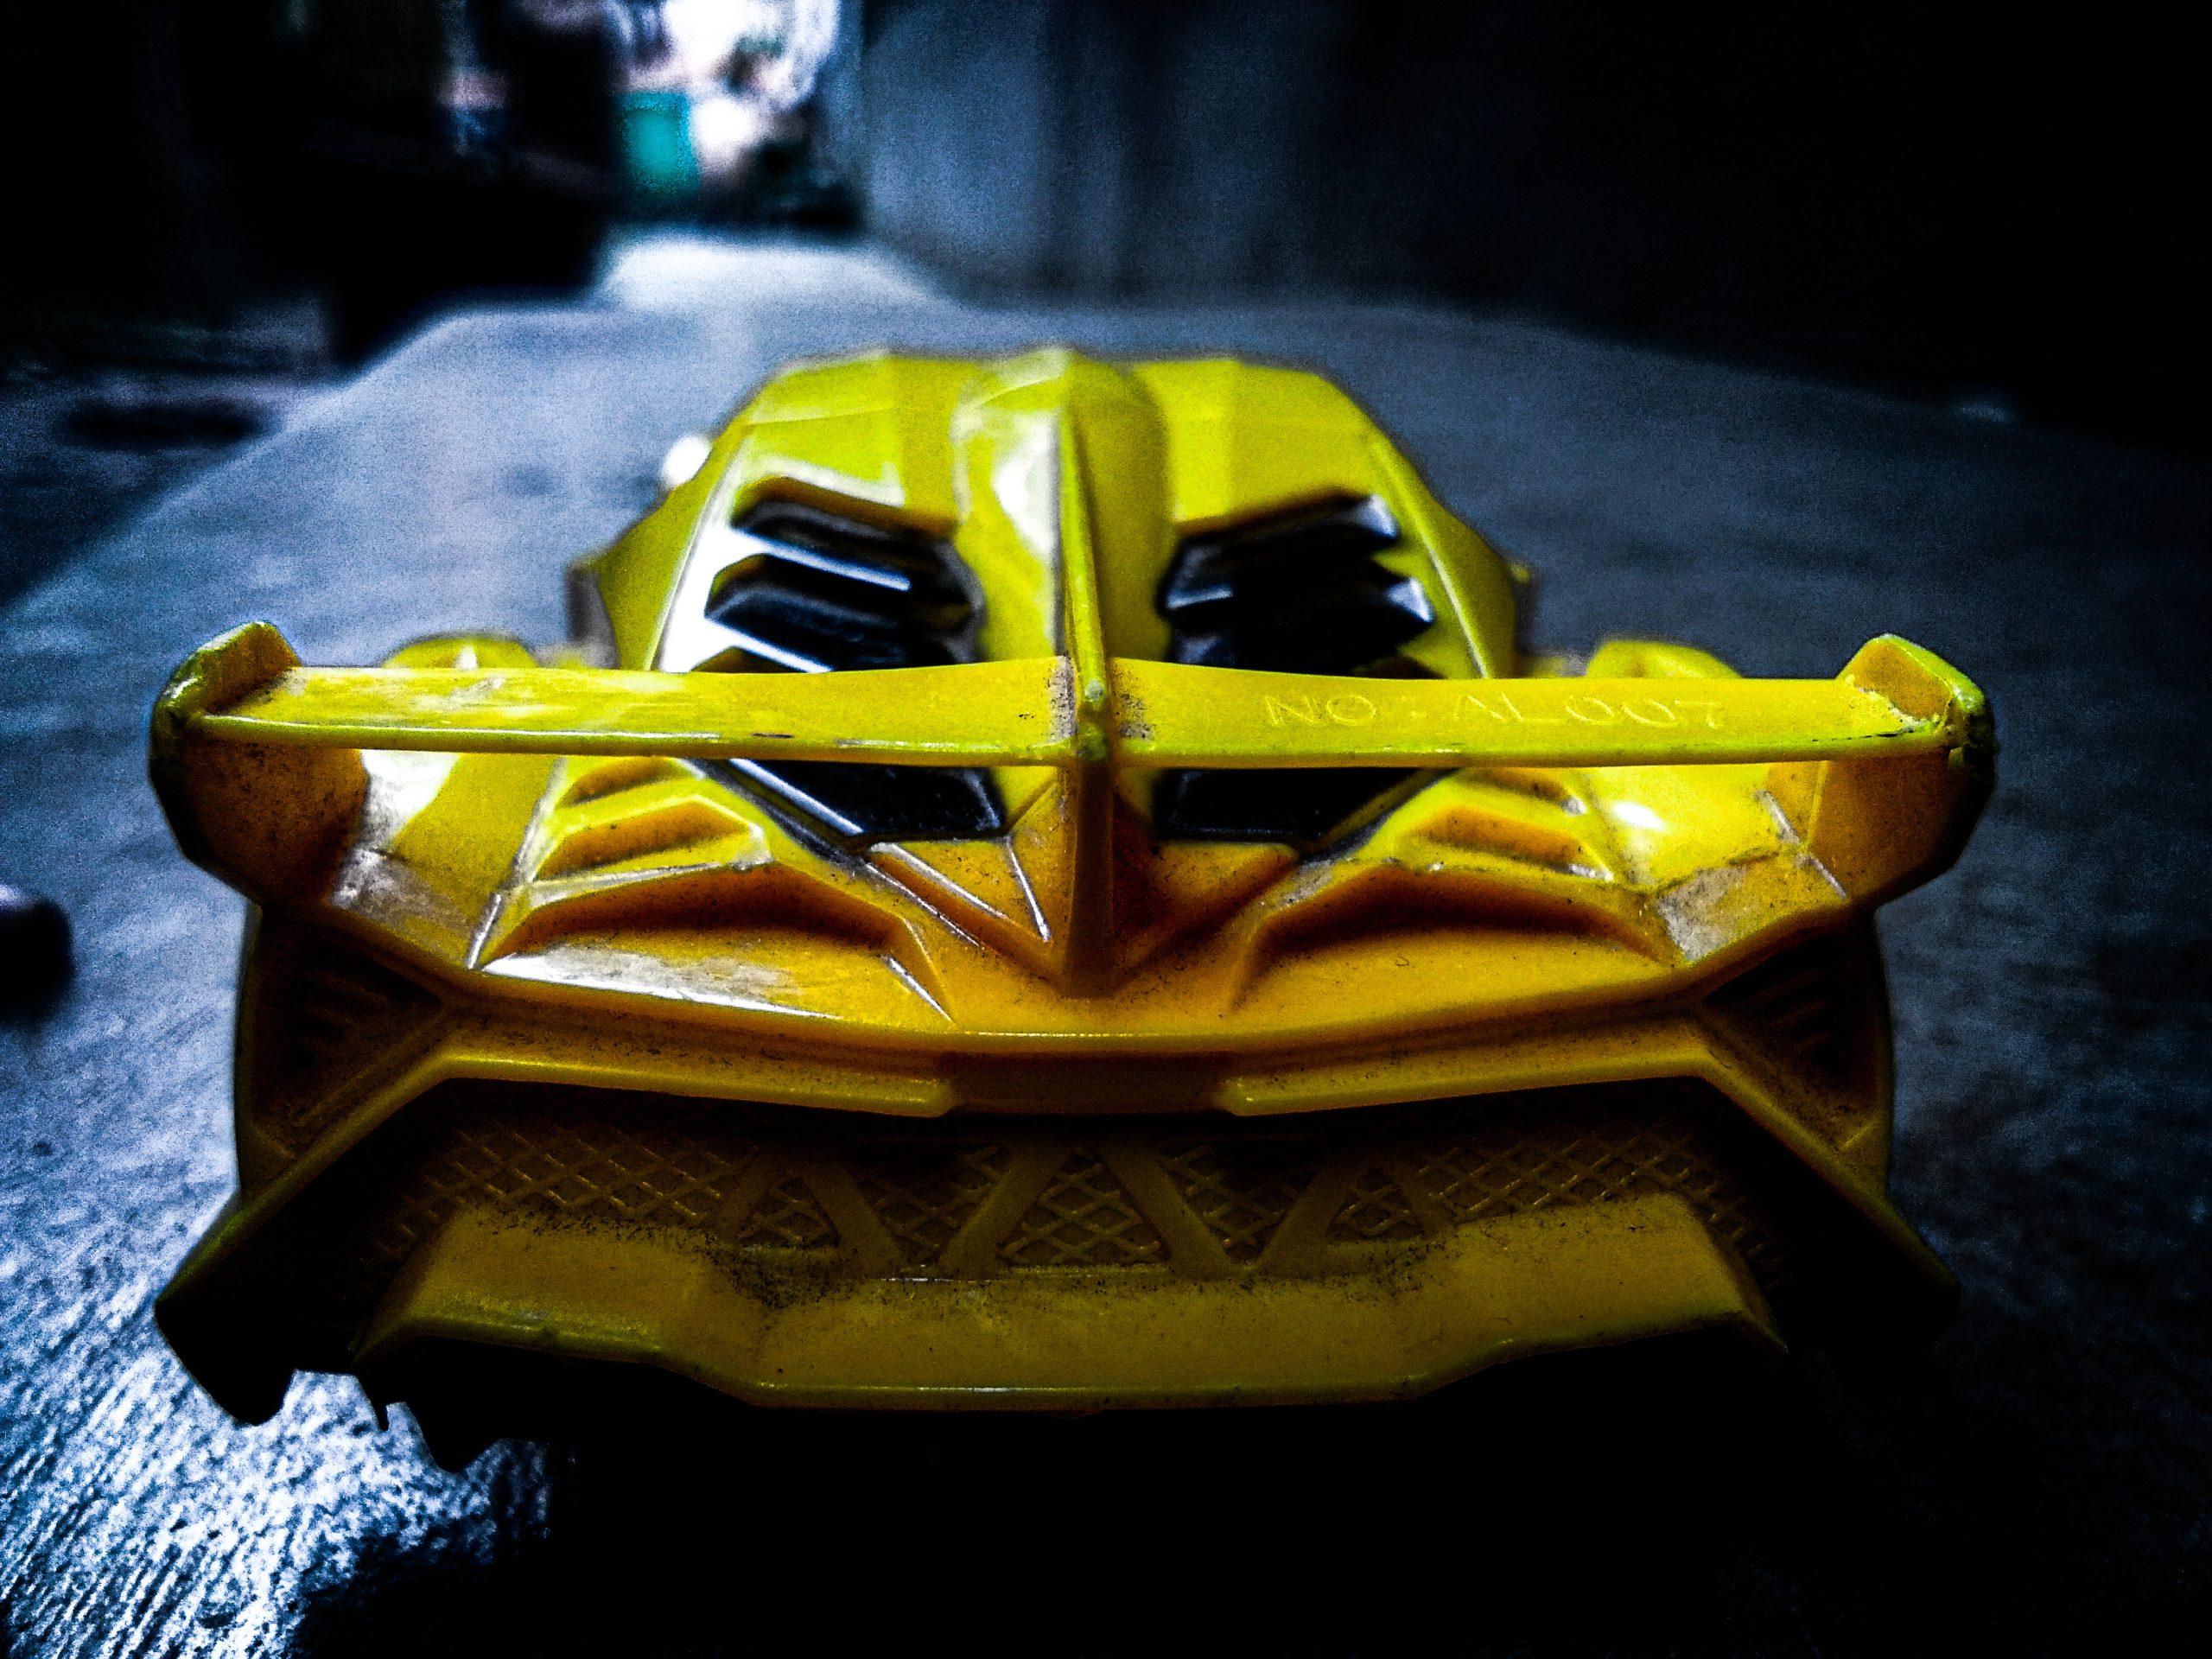 Lamborghini toy car